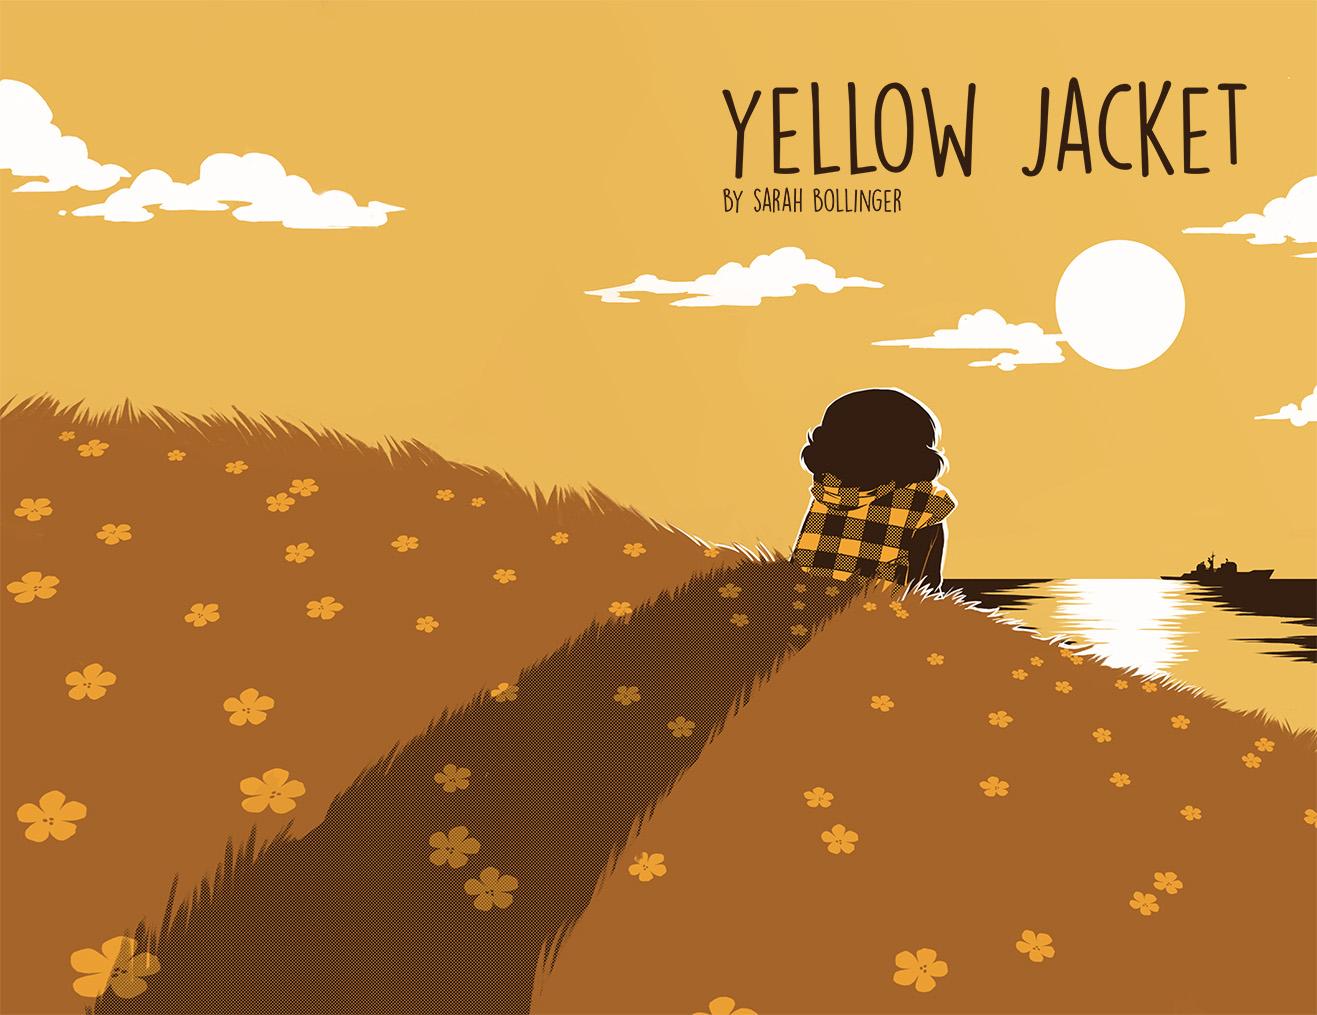 Sarah- YellowJacket_00.jpg